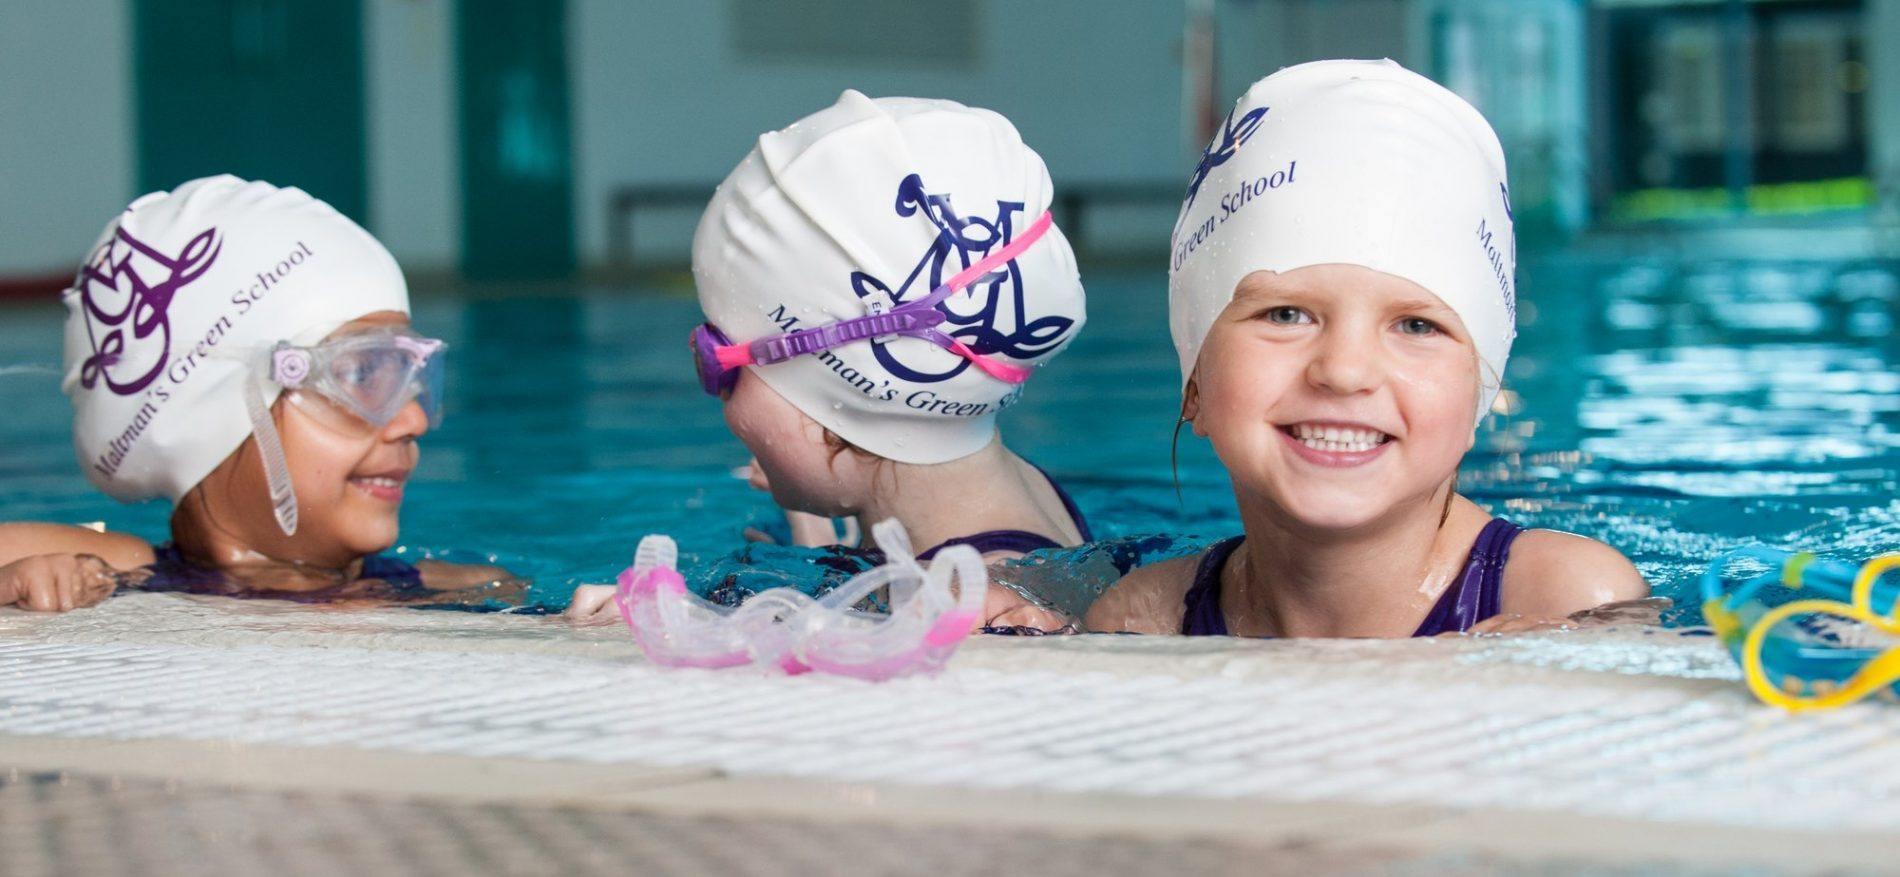 Swimming Facilities at Private School